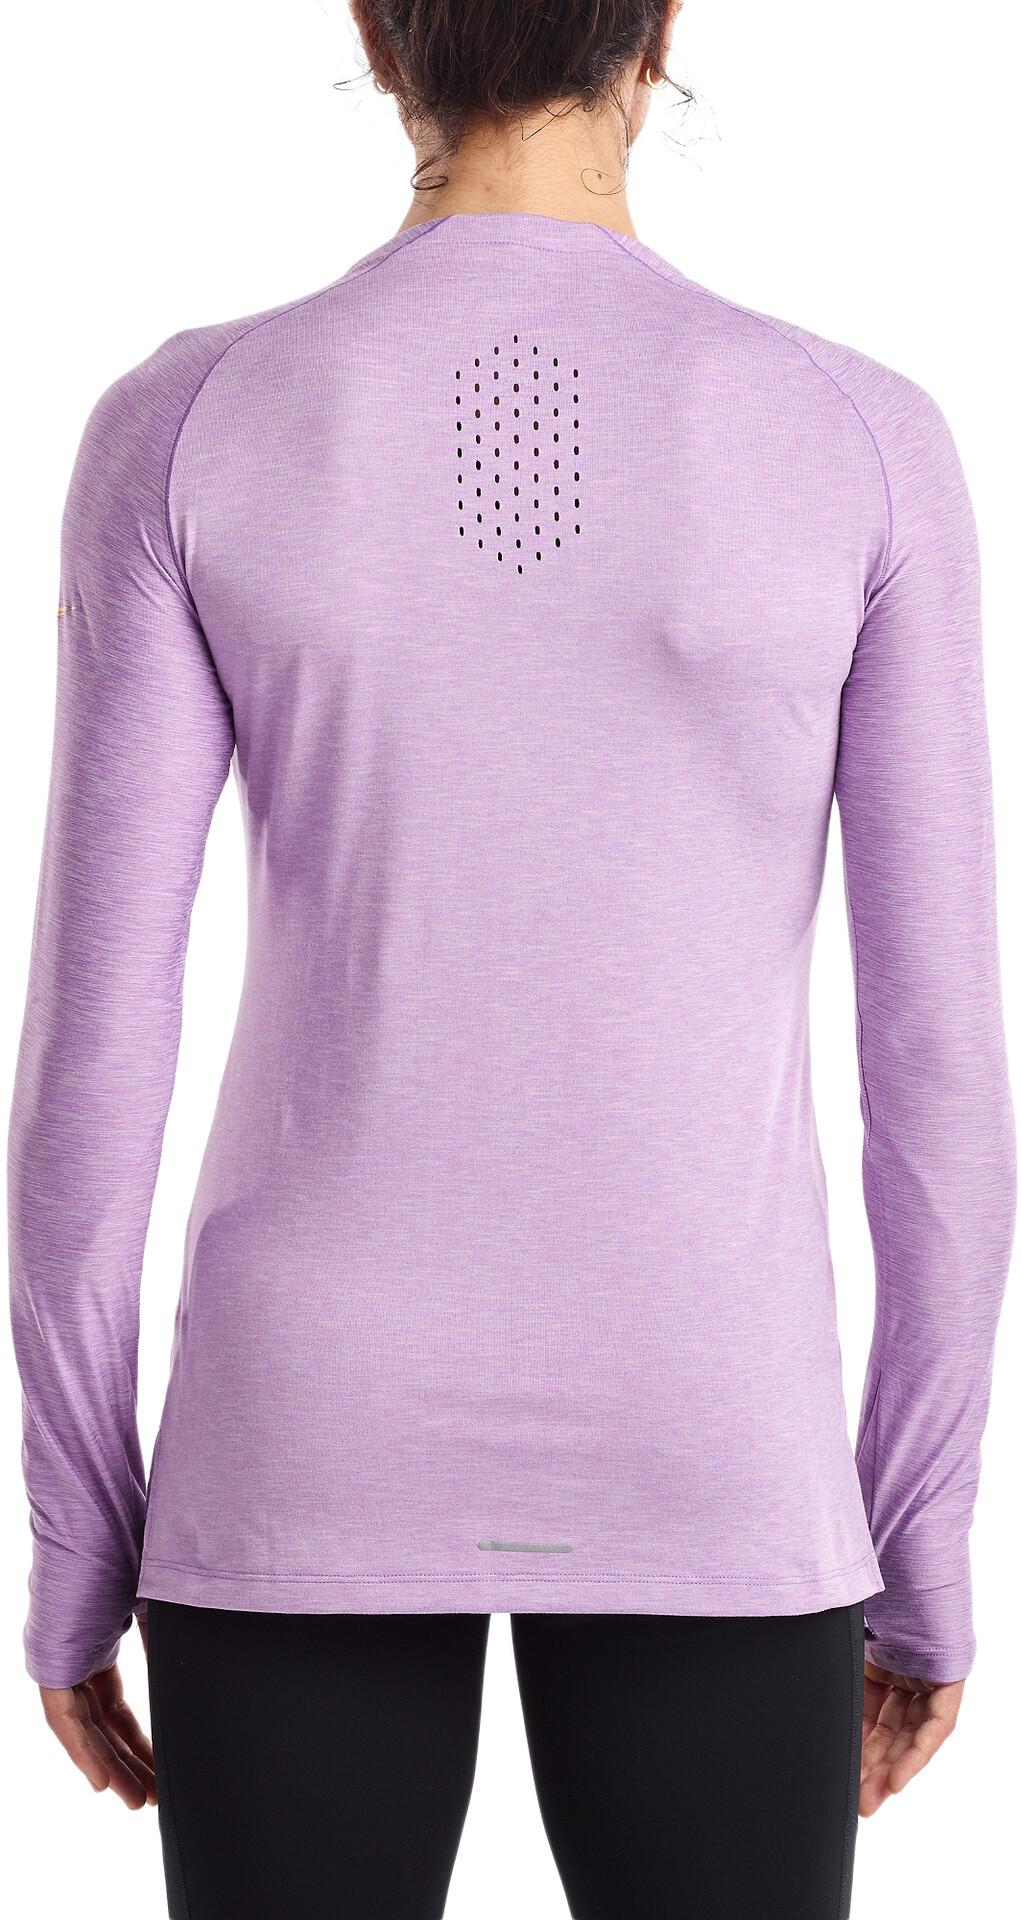 saucony Breakthru Long Sleeve Shirt Women, sunlit allium